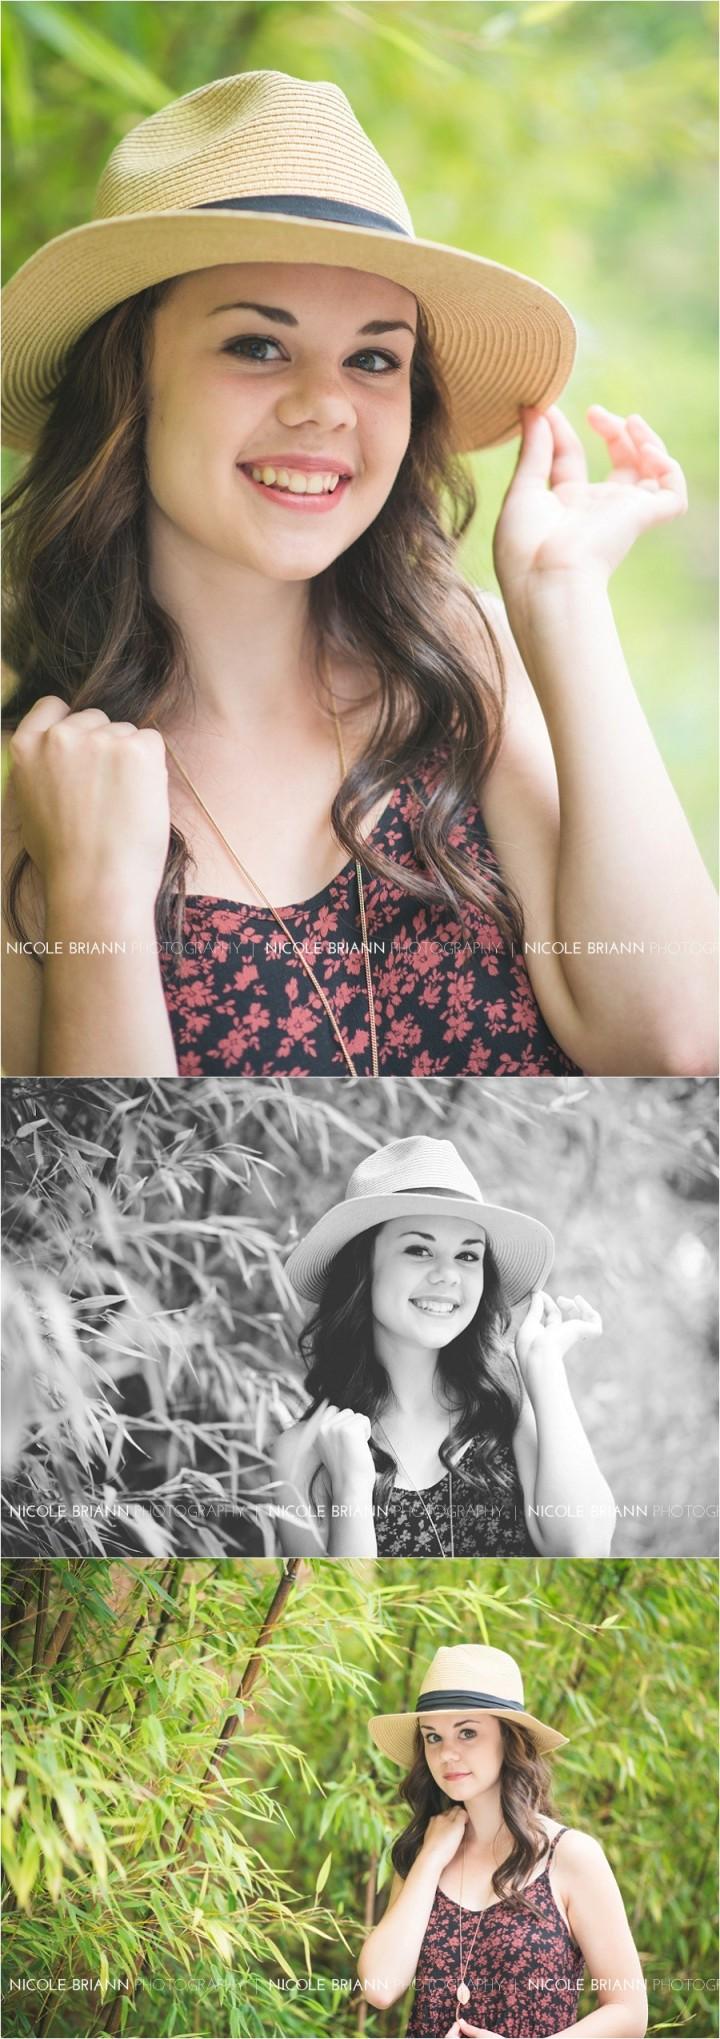 sweet-home-oregon-senior-portrait-photographer-nicole-briann-photography-maria_0001